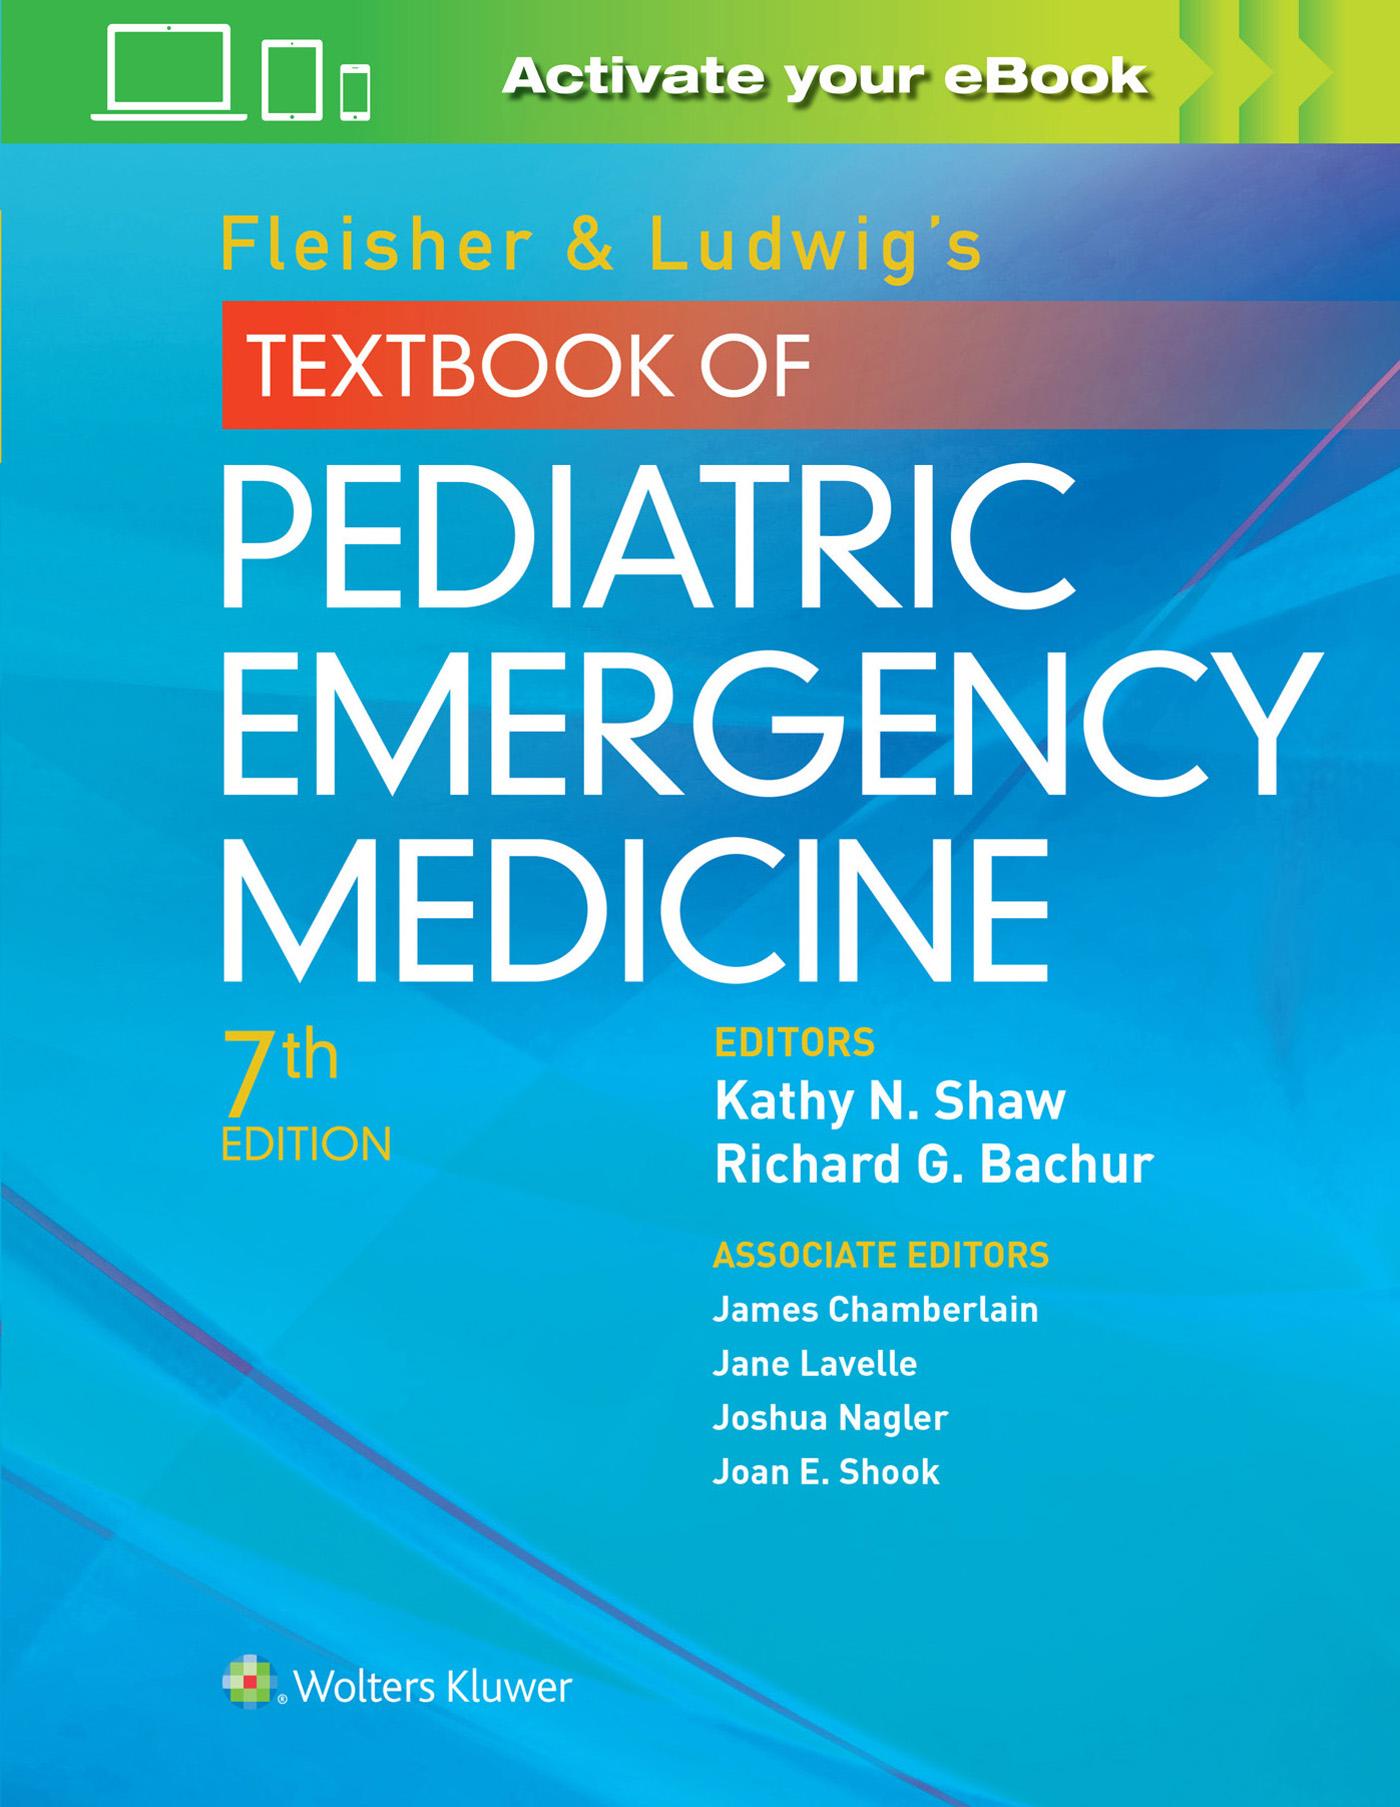 Fleisher & Ludwig's Textbook of Pediatric Emergency .